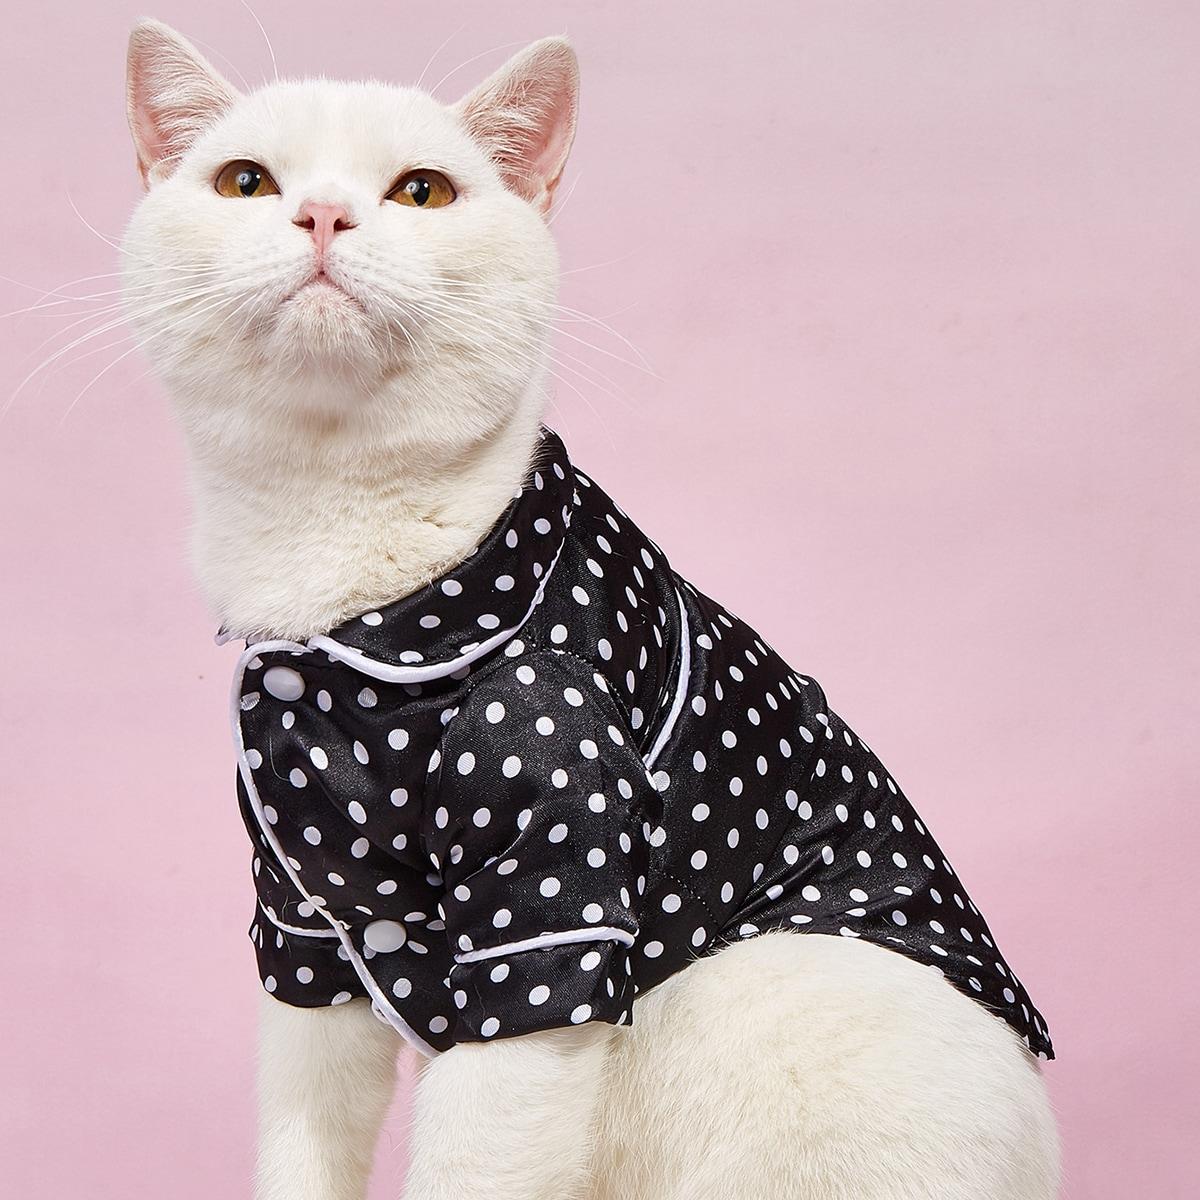 Polka Dot Pattern Pet Shirt, SHEIN  - buy with discount